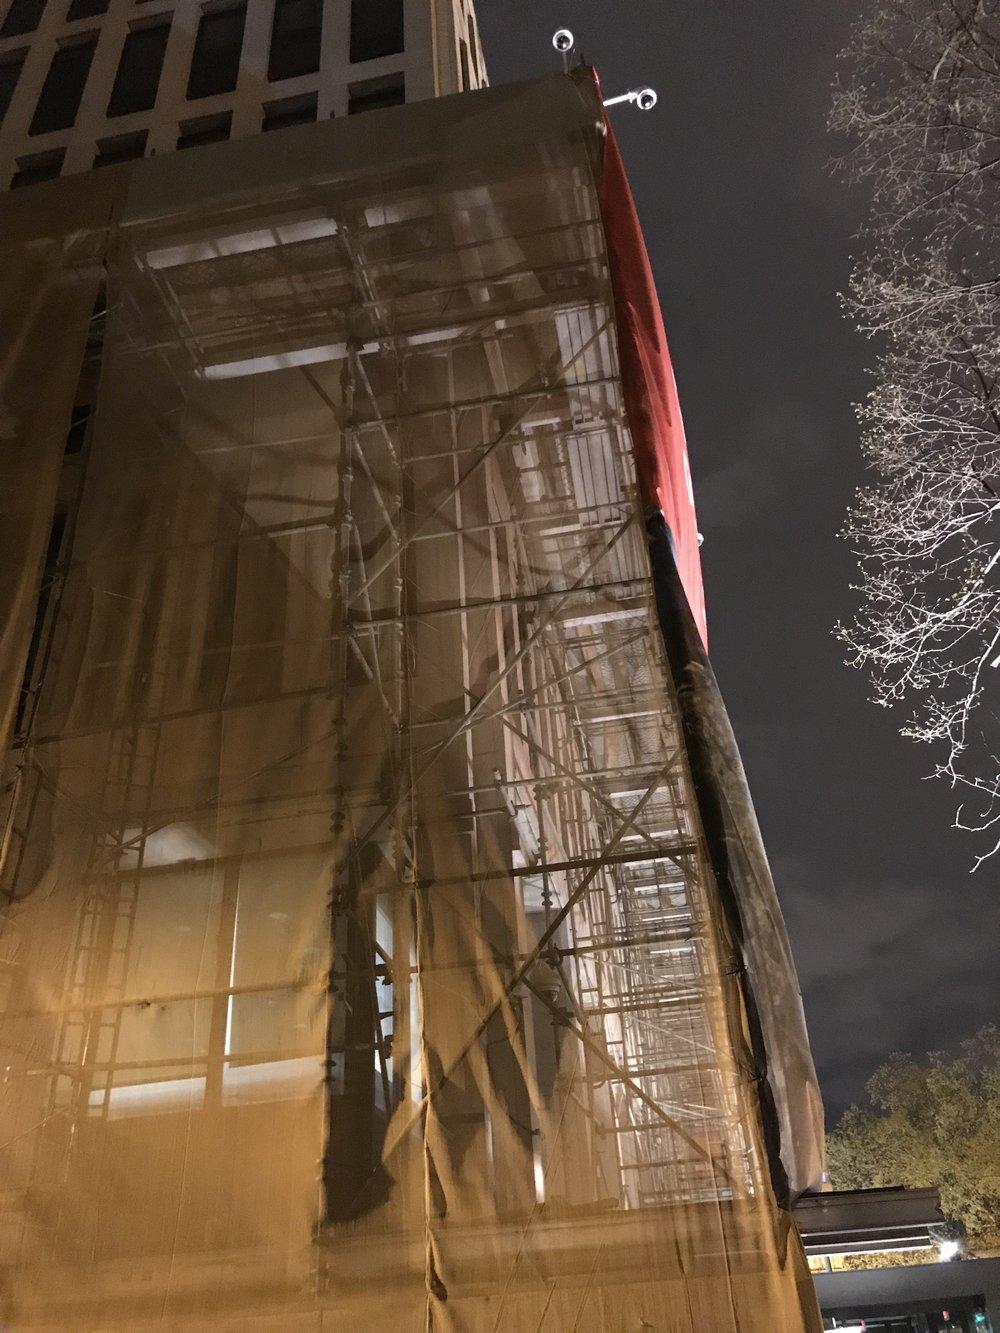 The Embassy of Australia under construction.